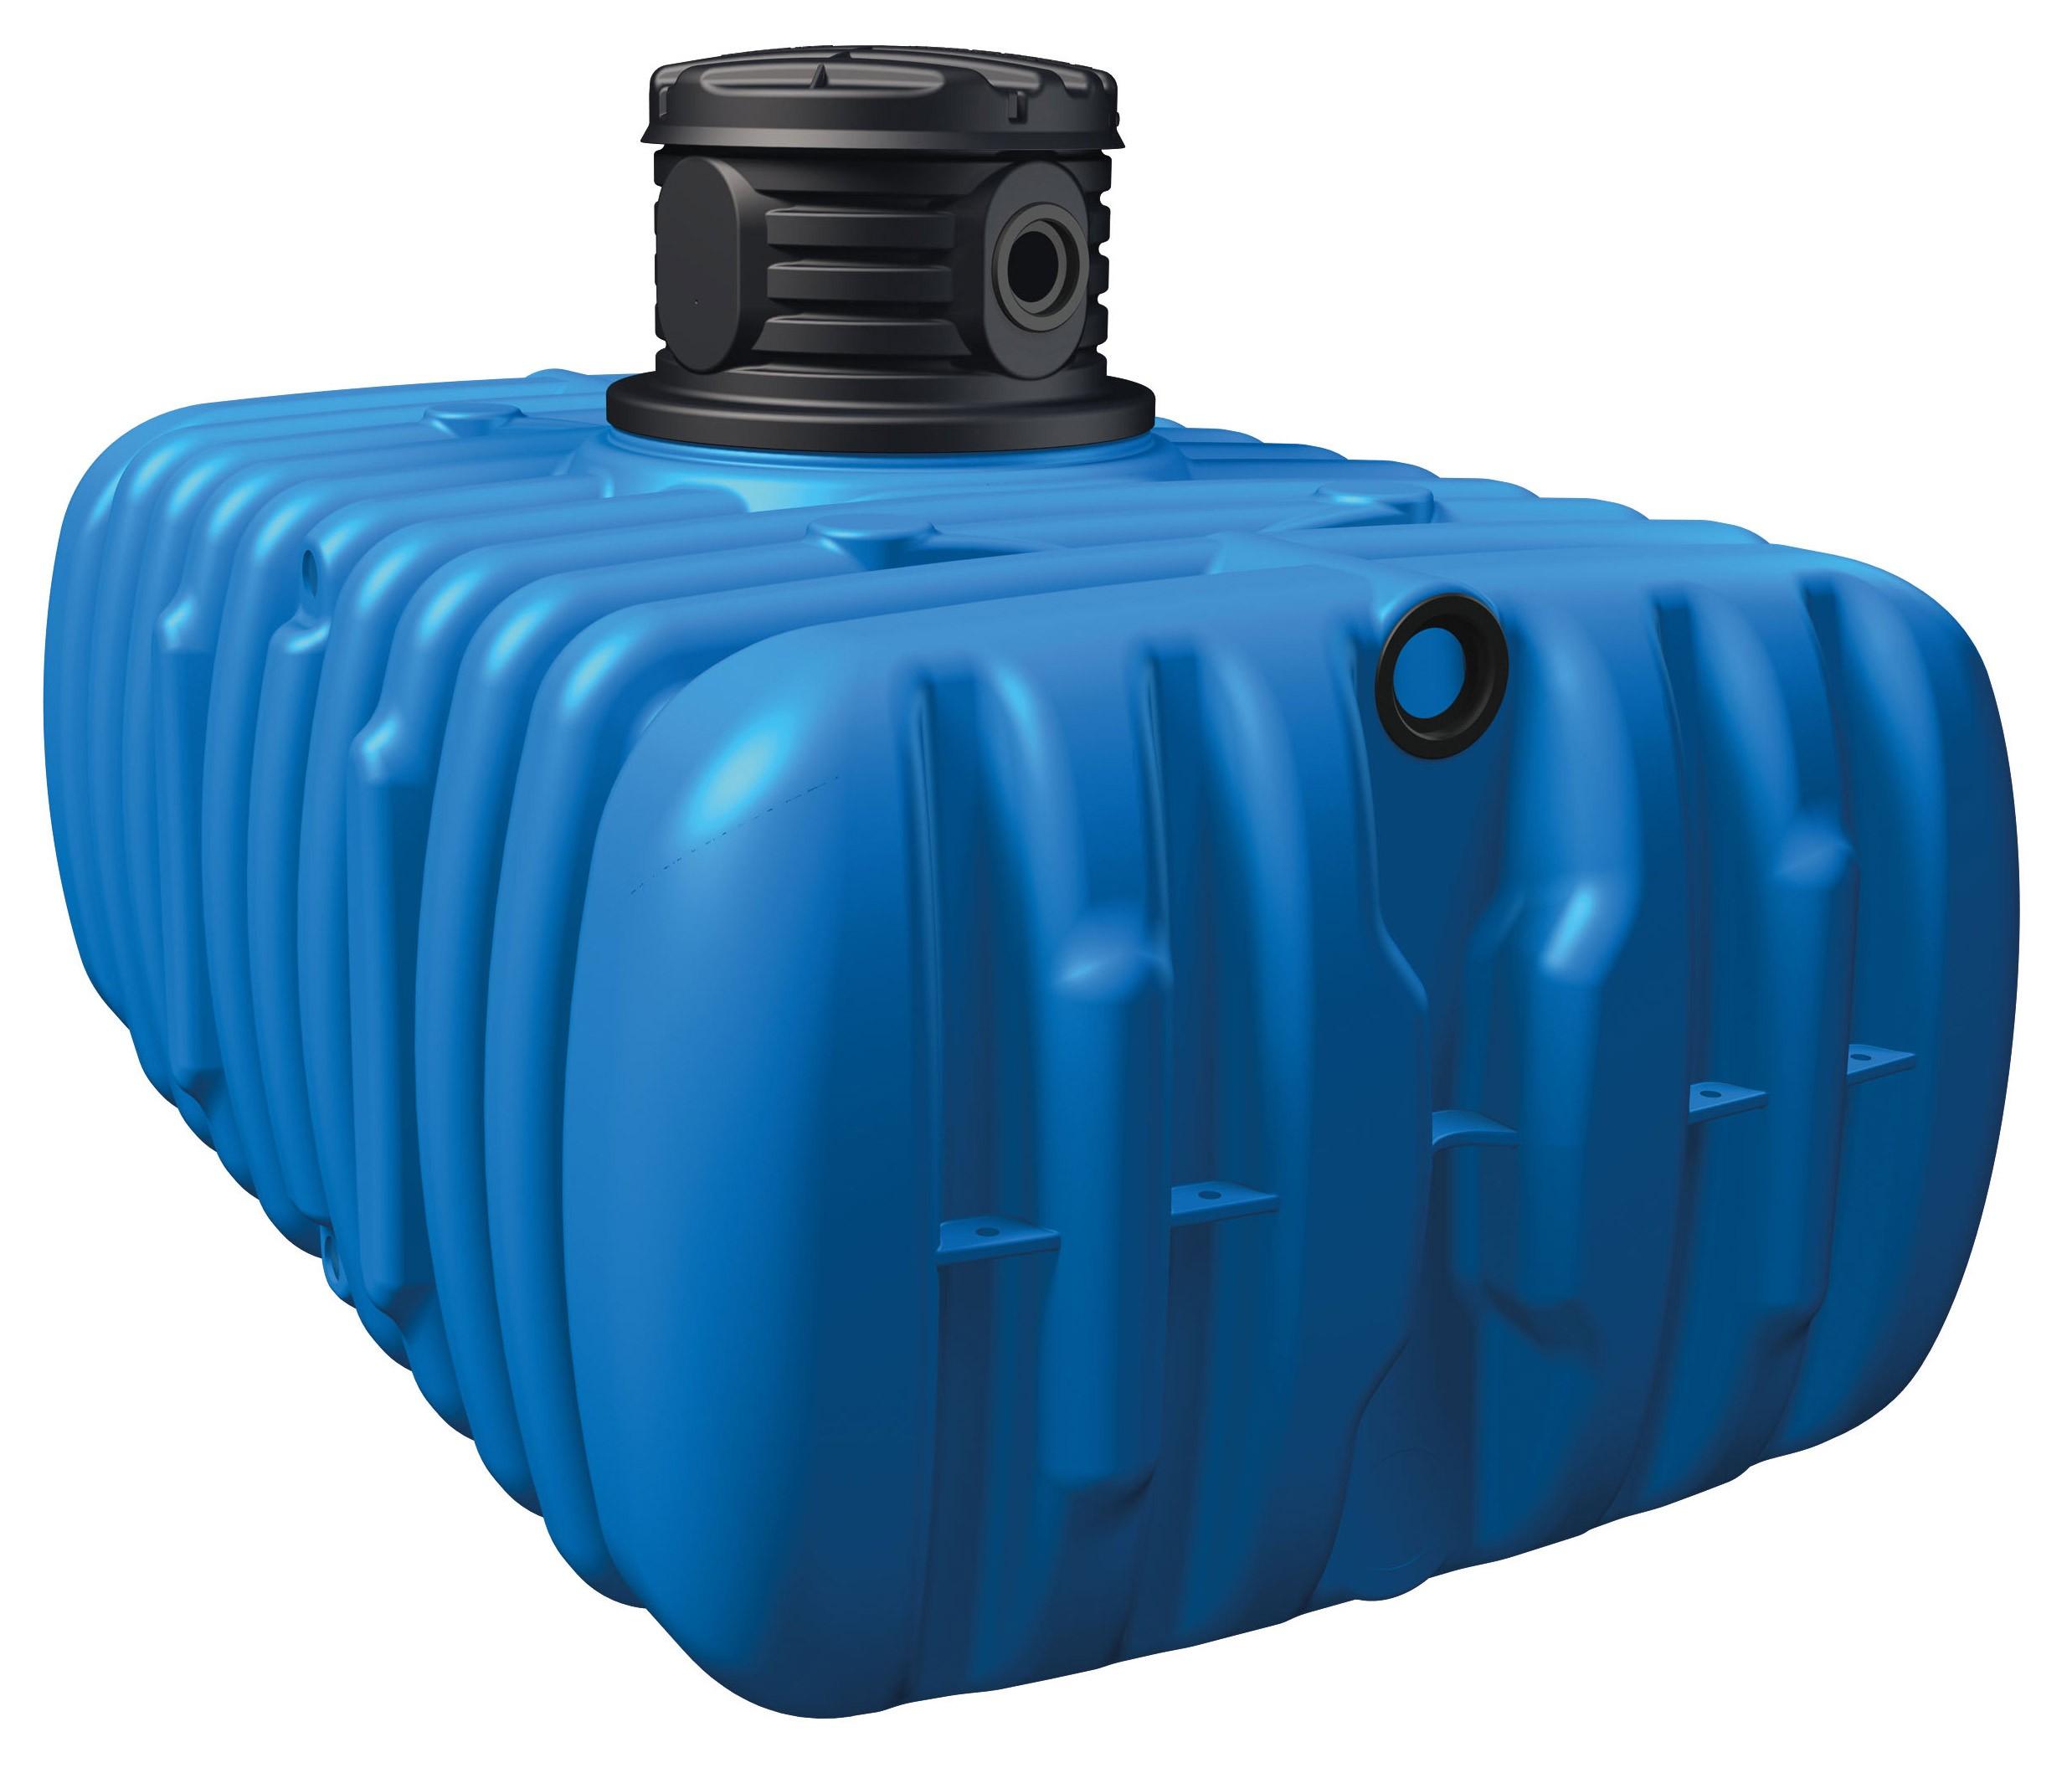 Flachtank / Erdtank begehbar FLAT M 3.000 Liter 4Rain 295115 Bild 1